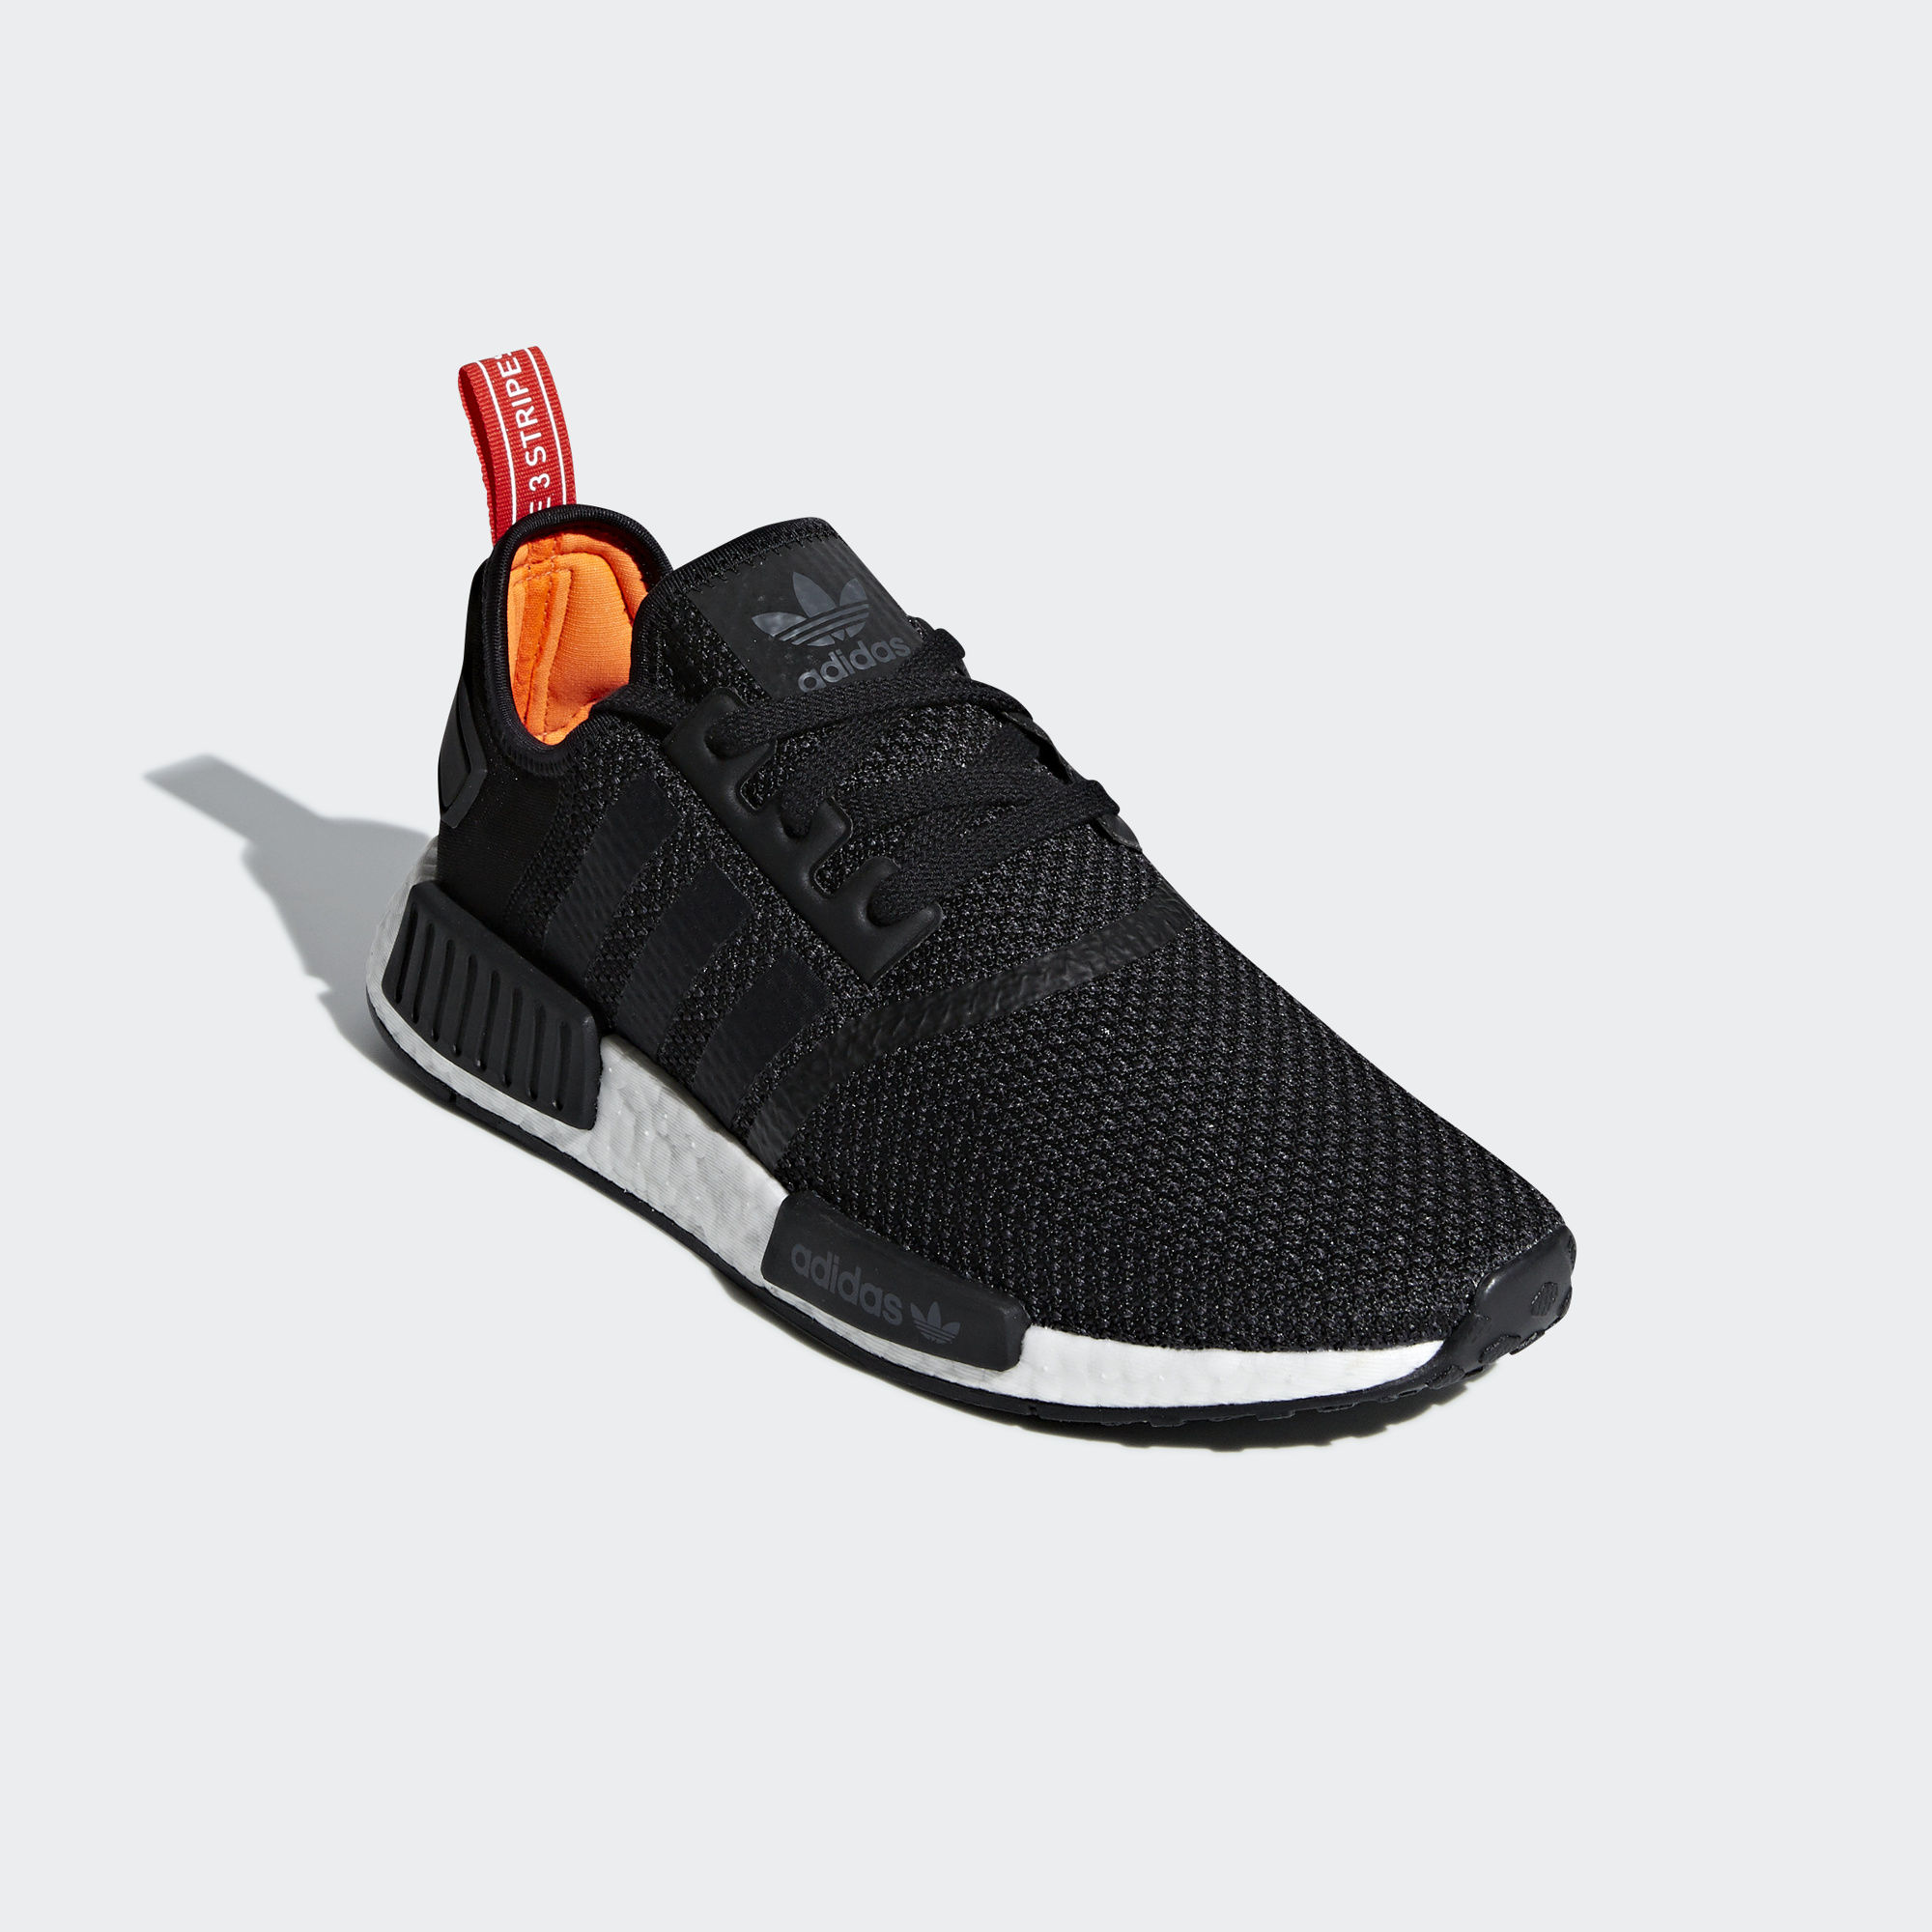 Adidas NMD_R1 Core Black / Core Black / Solar Orange (B37621)